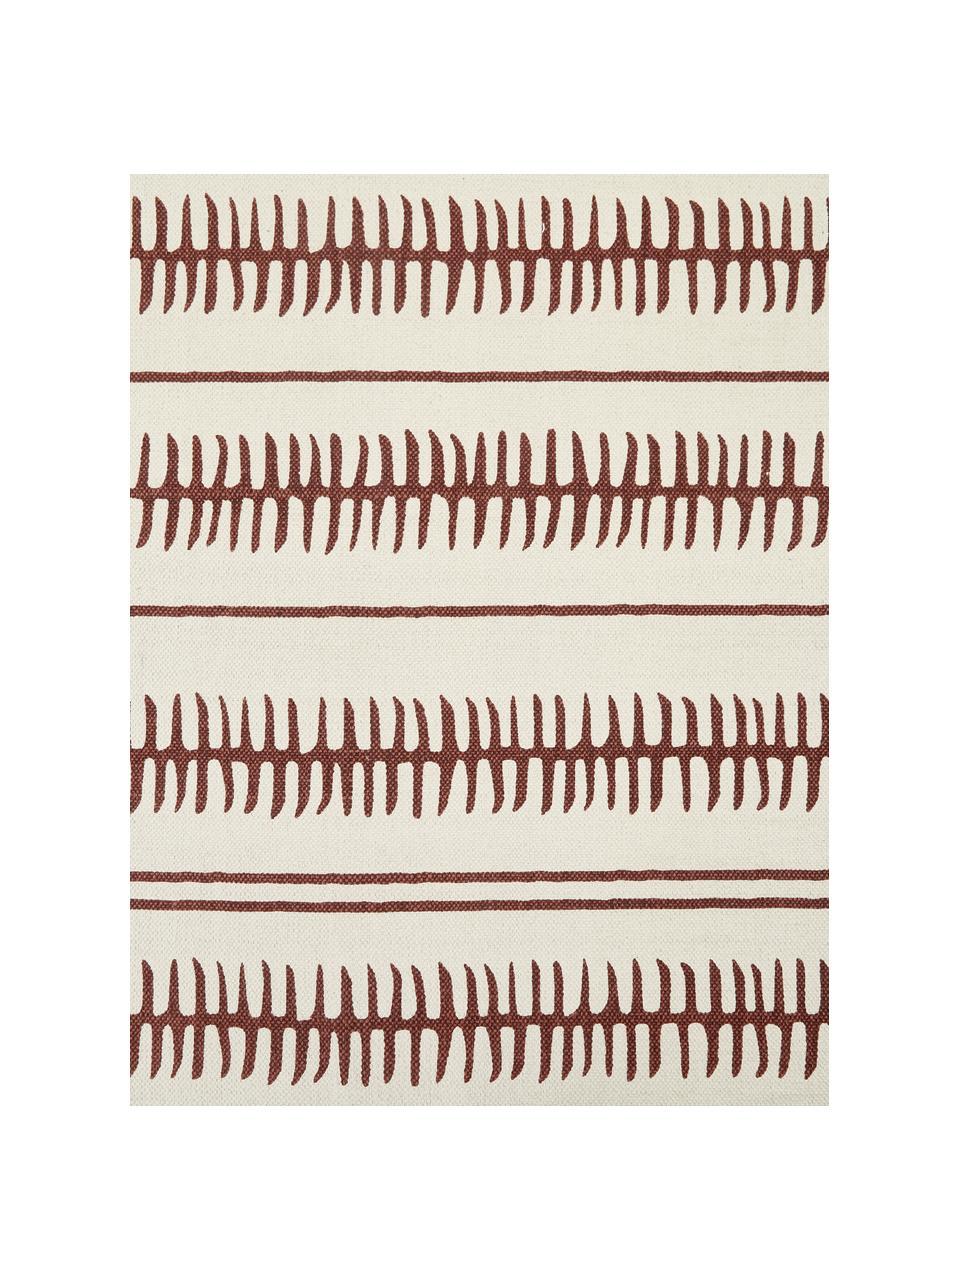 Tappeto in cotone beige/terracotta tessuto a mano Rita, Beige, terracotta, Larg. 50 x Lung. 80 cm (taglia XXS)